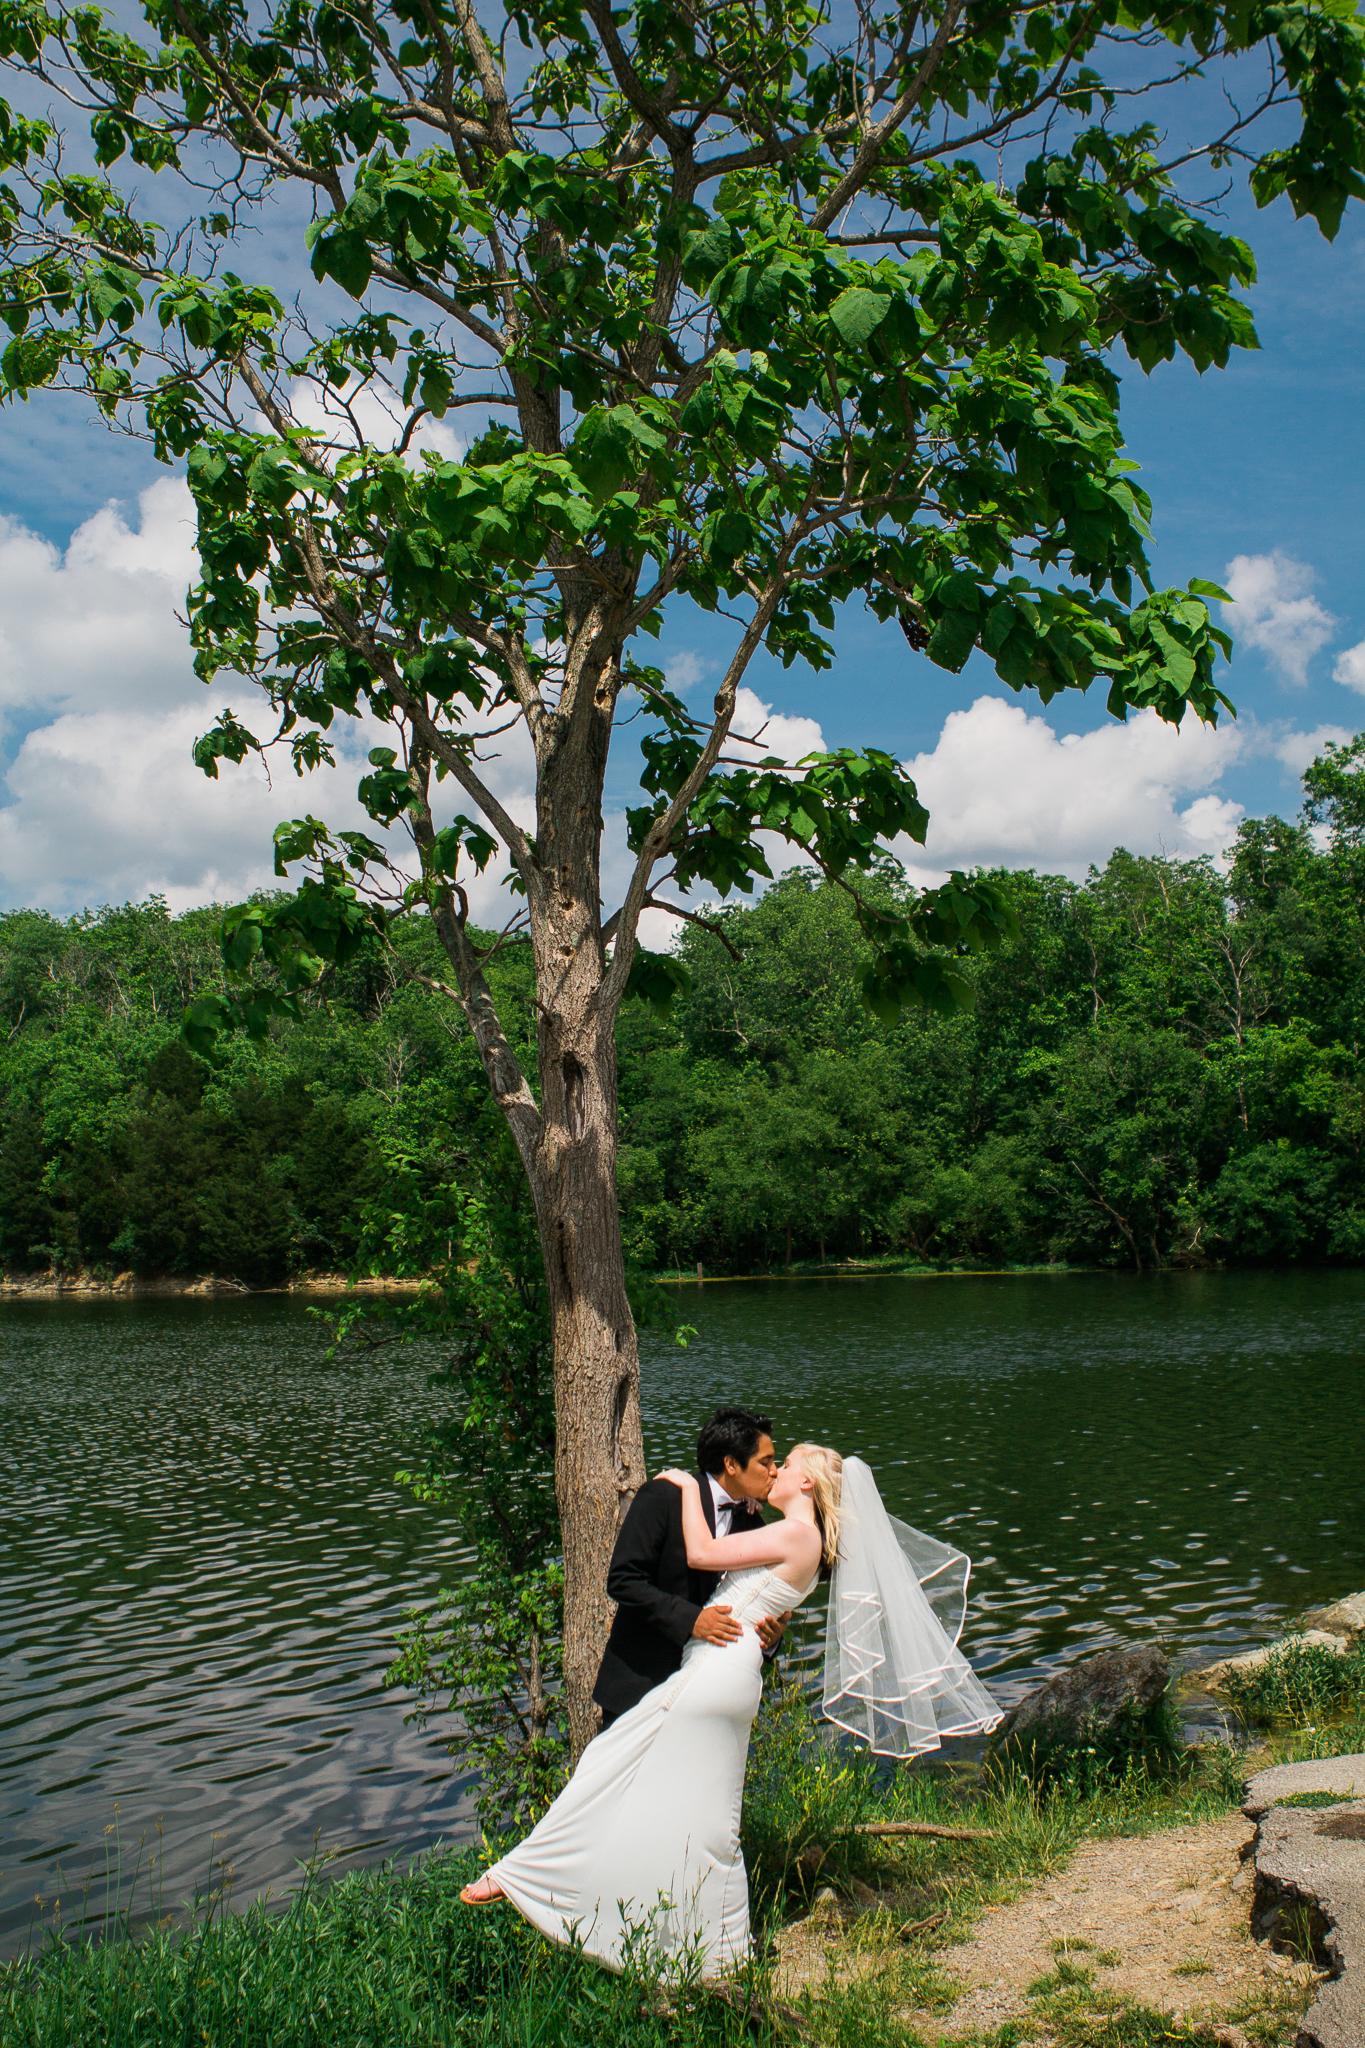 Richmond Kentucky Wedding Photographer - Ariana Jordan Photography -3-2.jpg